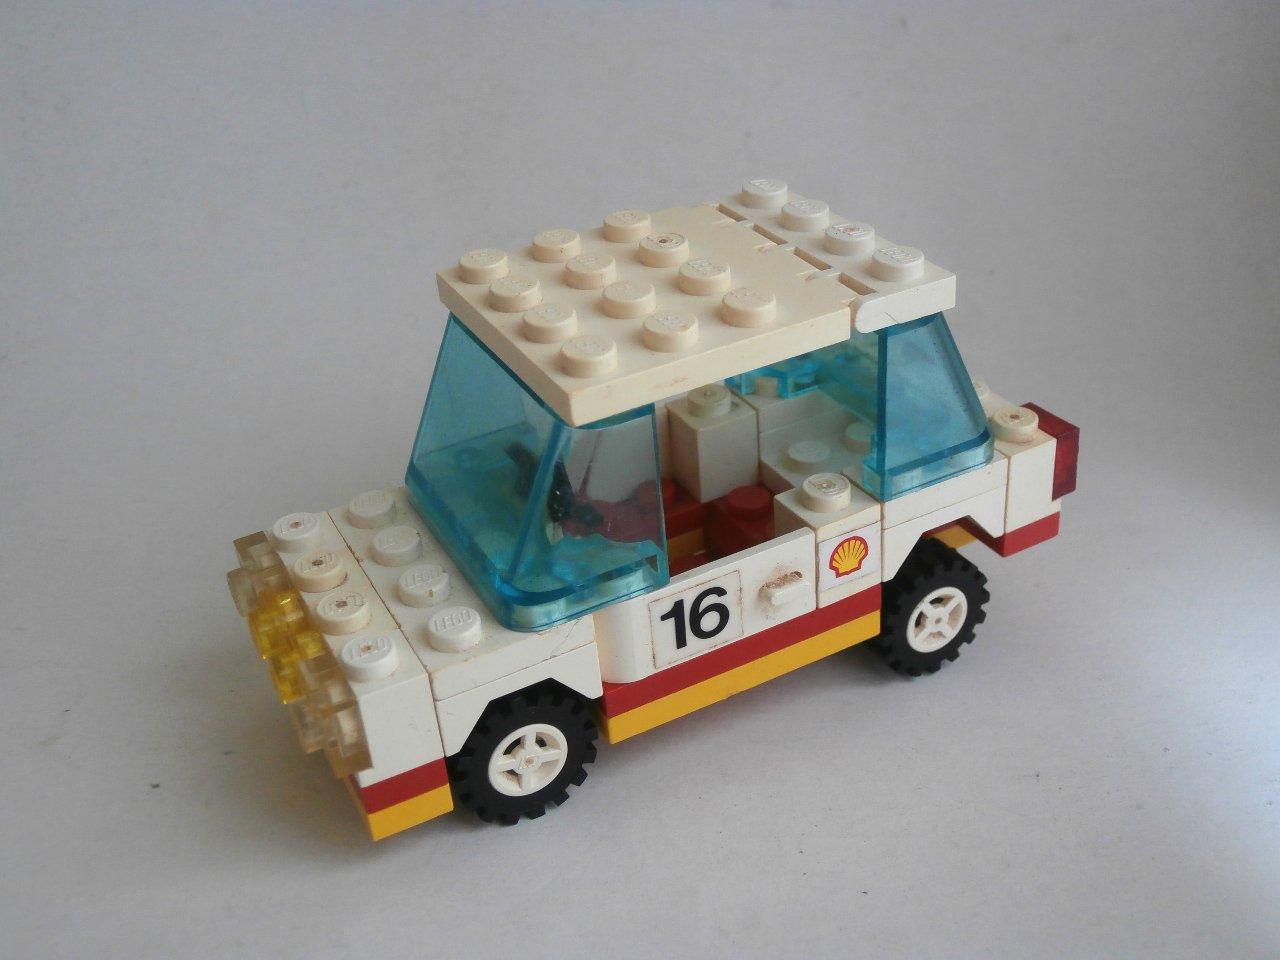 Lego Classic Town 6634-1 Stock Car 1986 Set